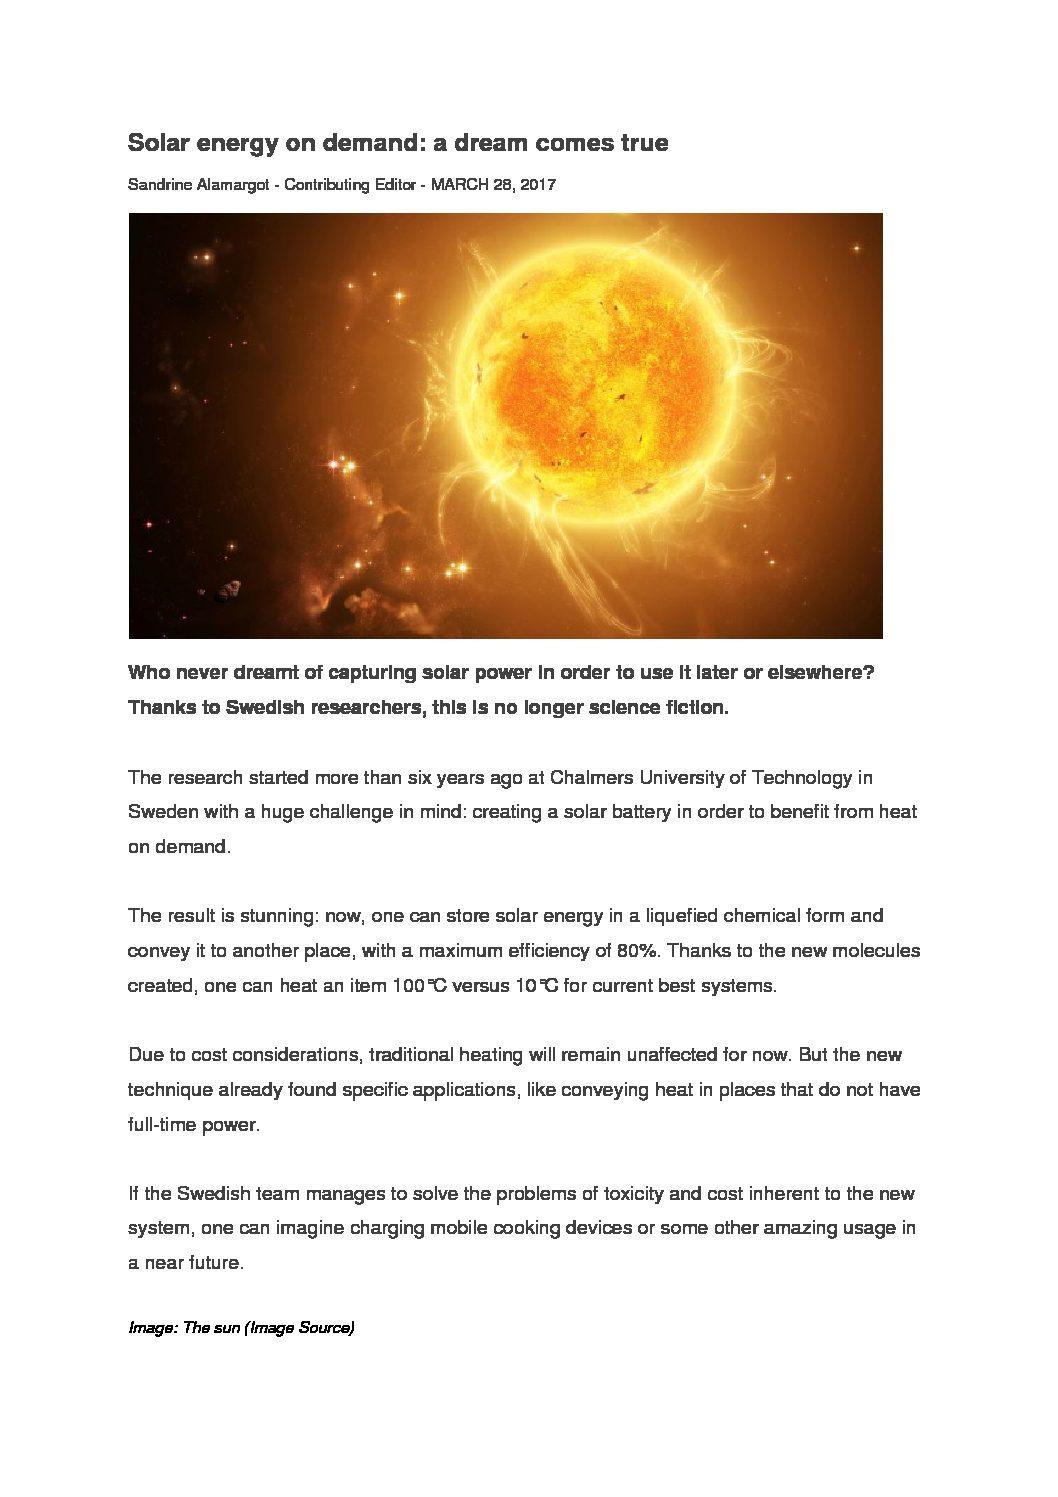 Solar energy on demand a dream comes true